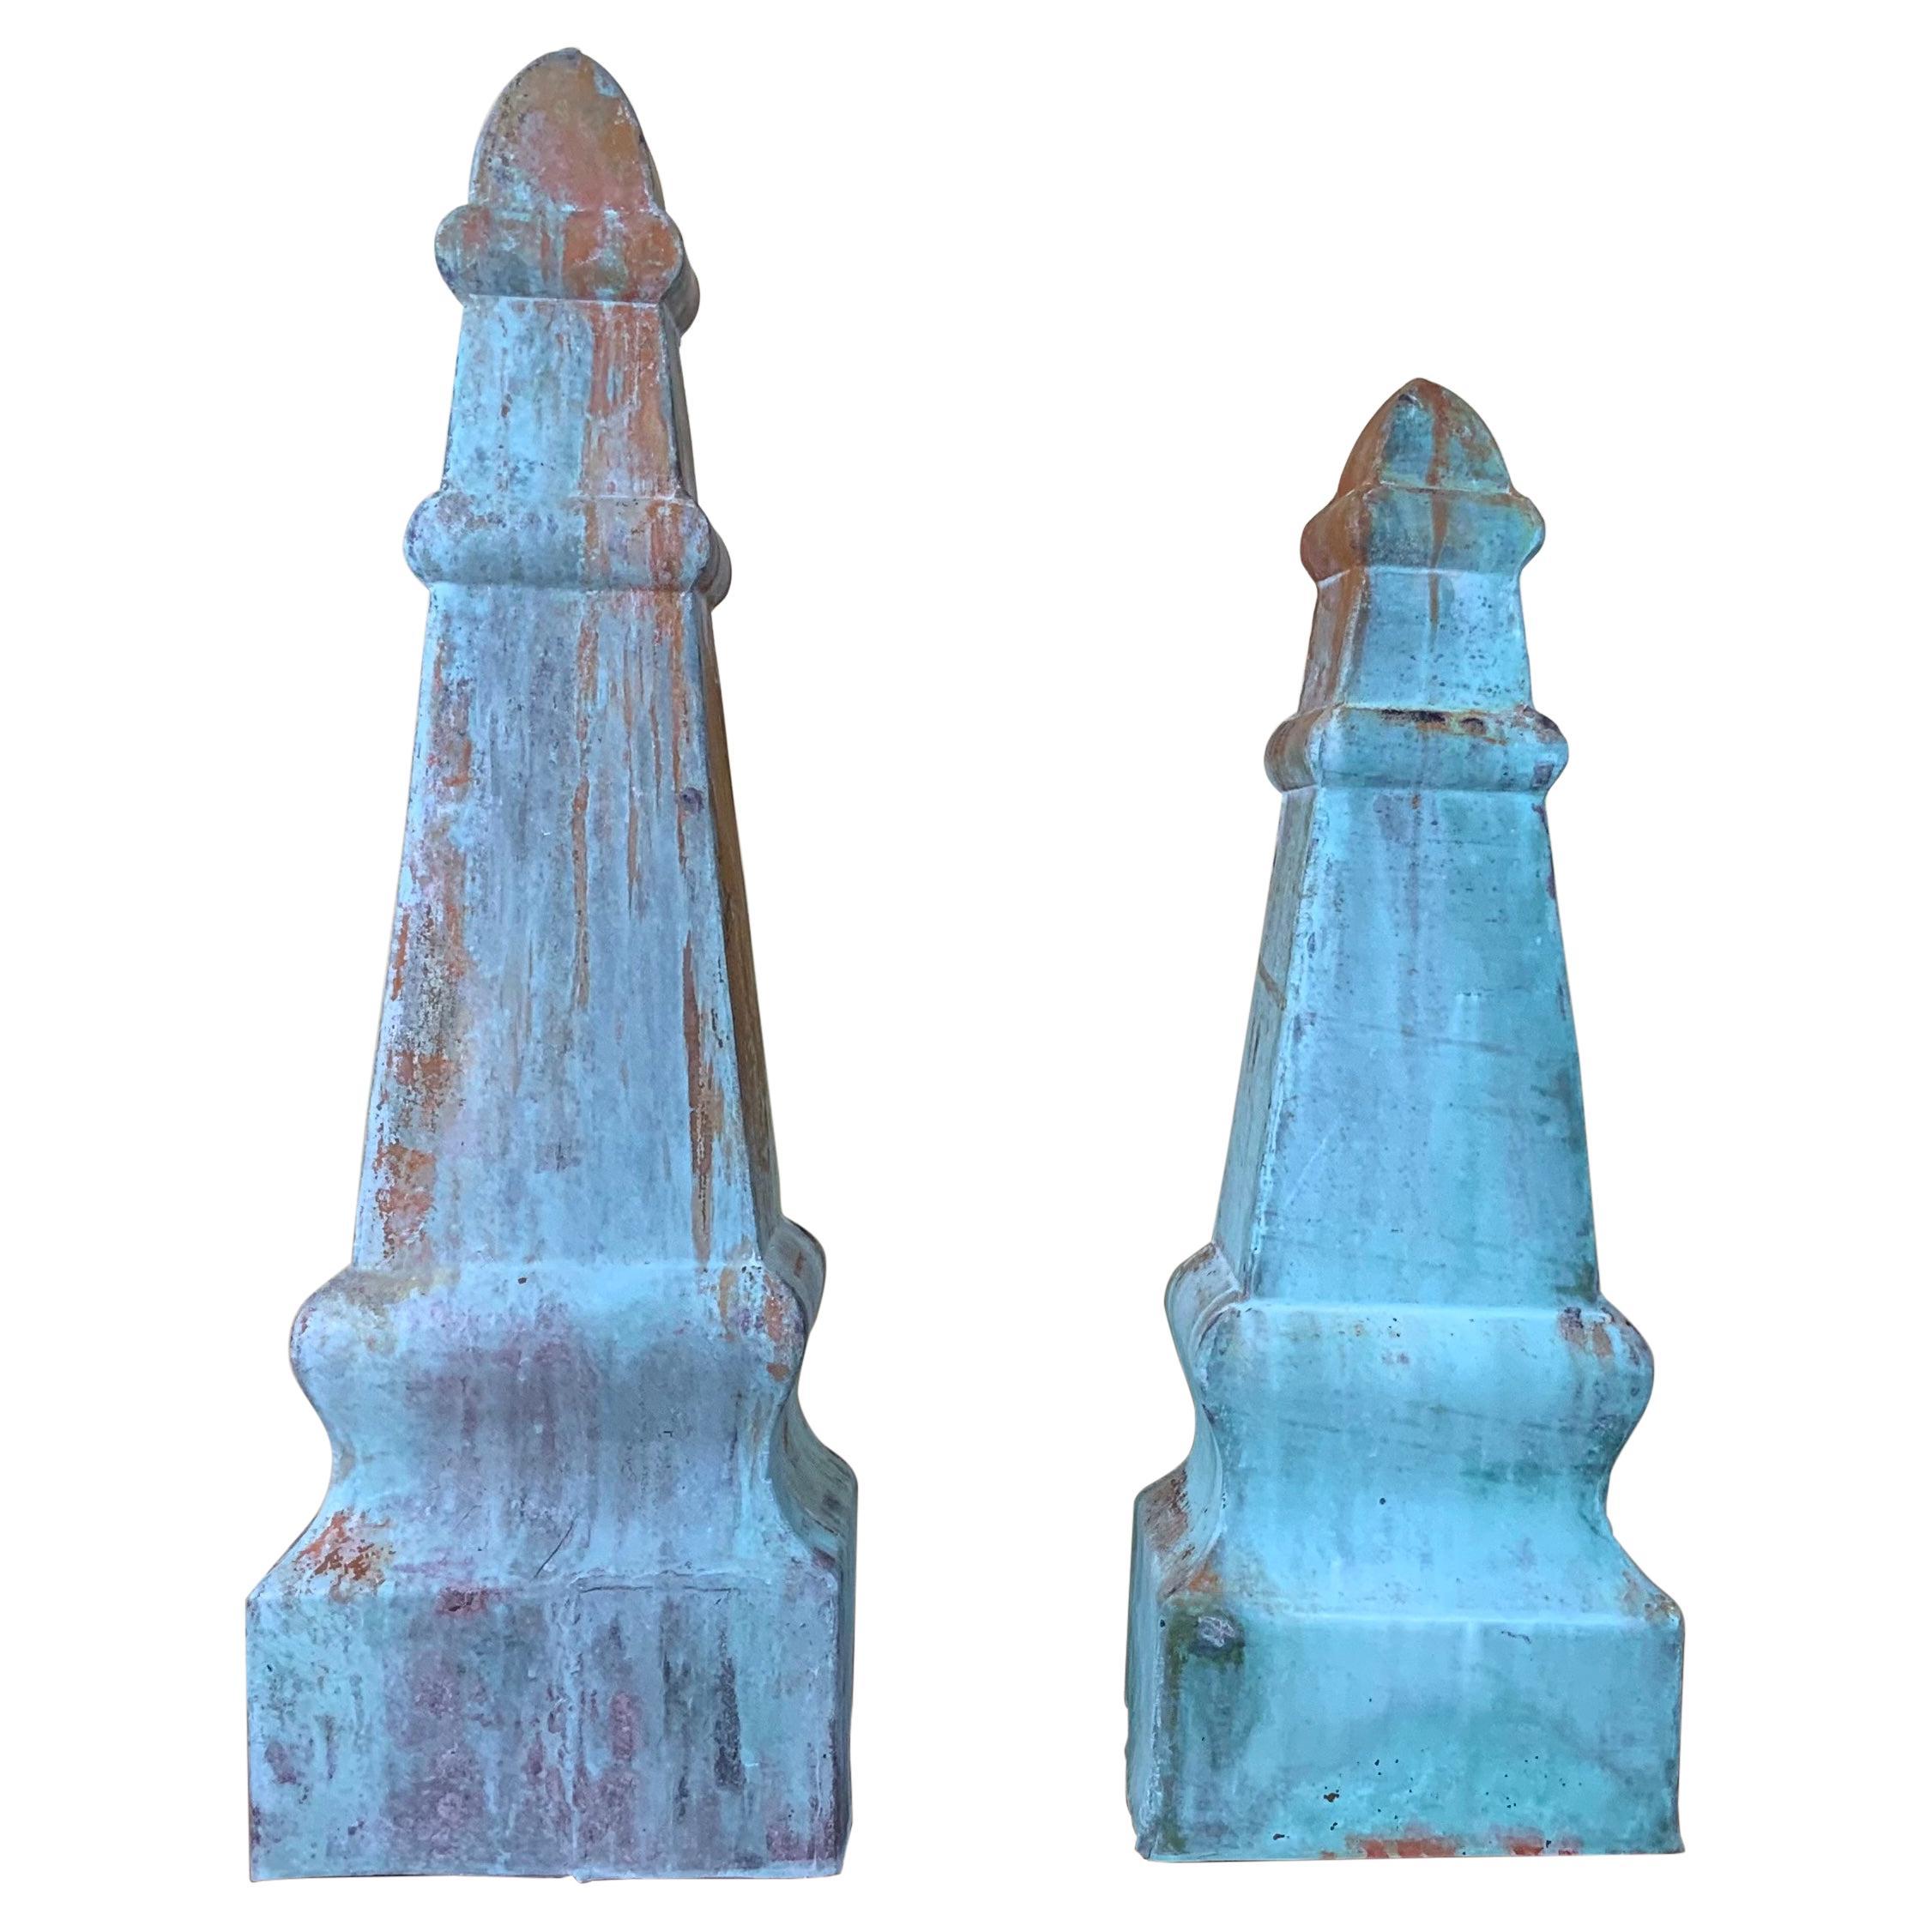 Pair of Vintage Garden Obelisks